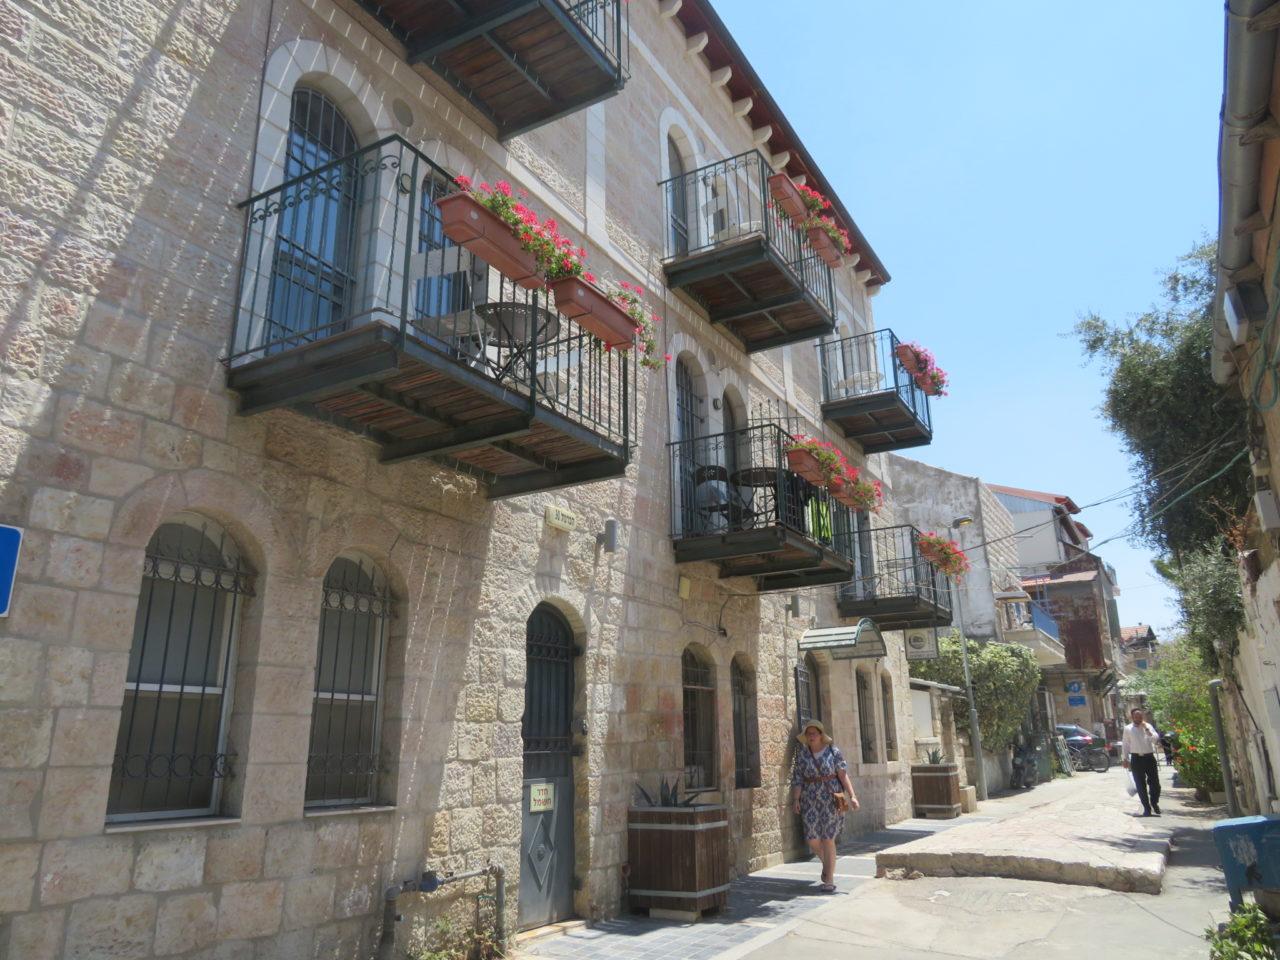 The joys of walking Jerusalem - the Nachlaot neighborhood